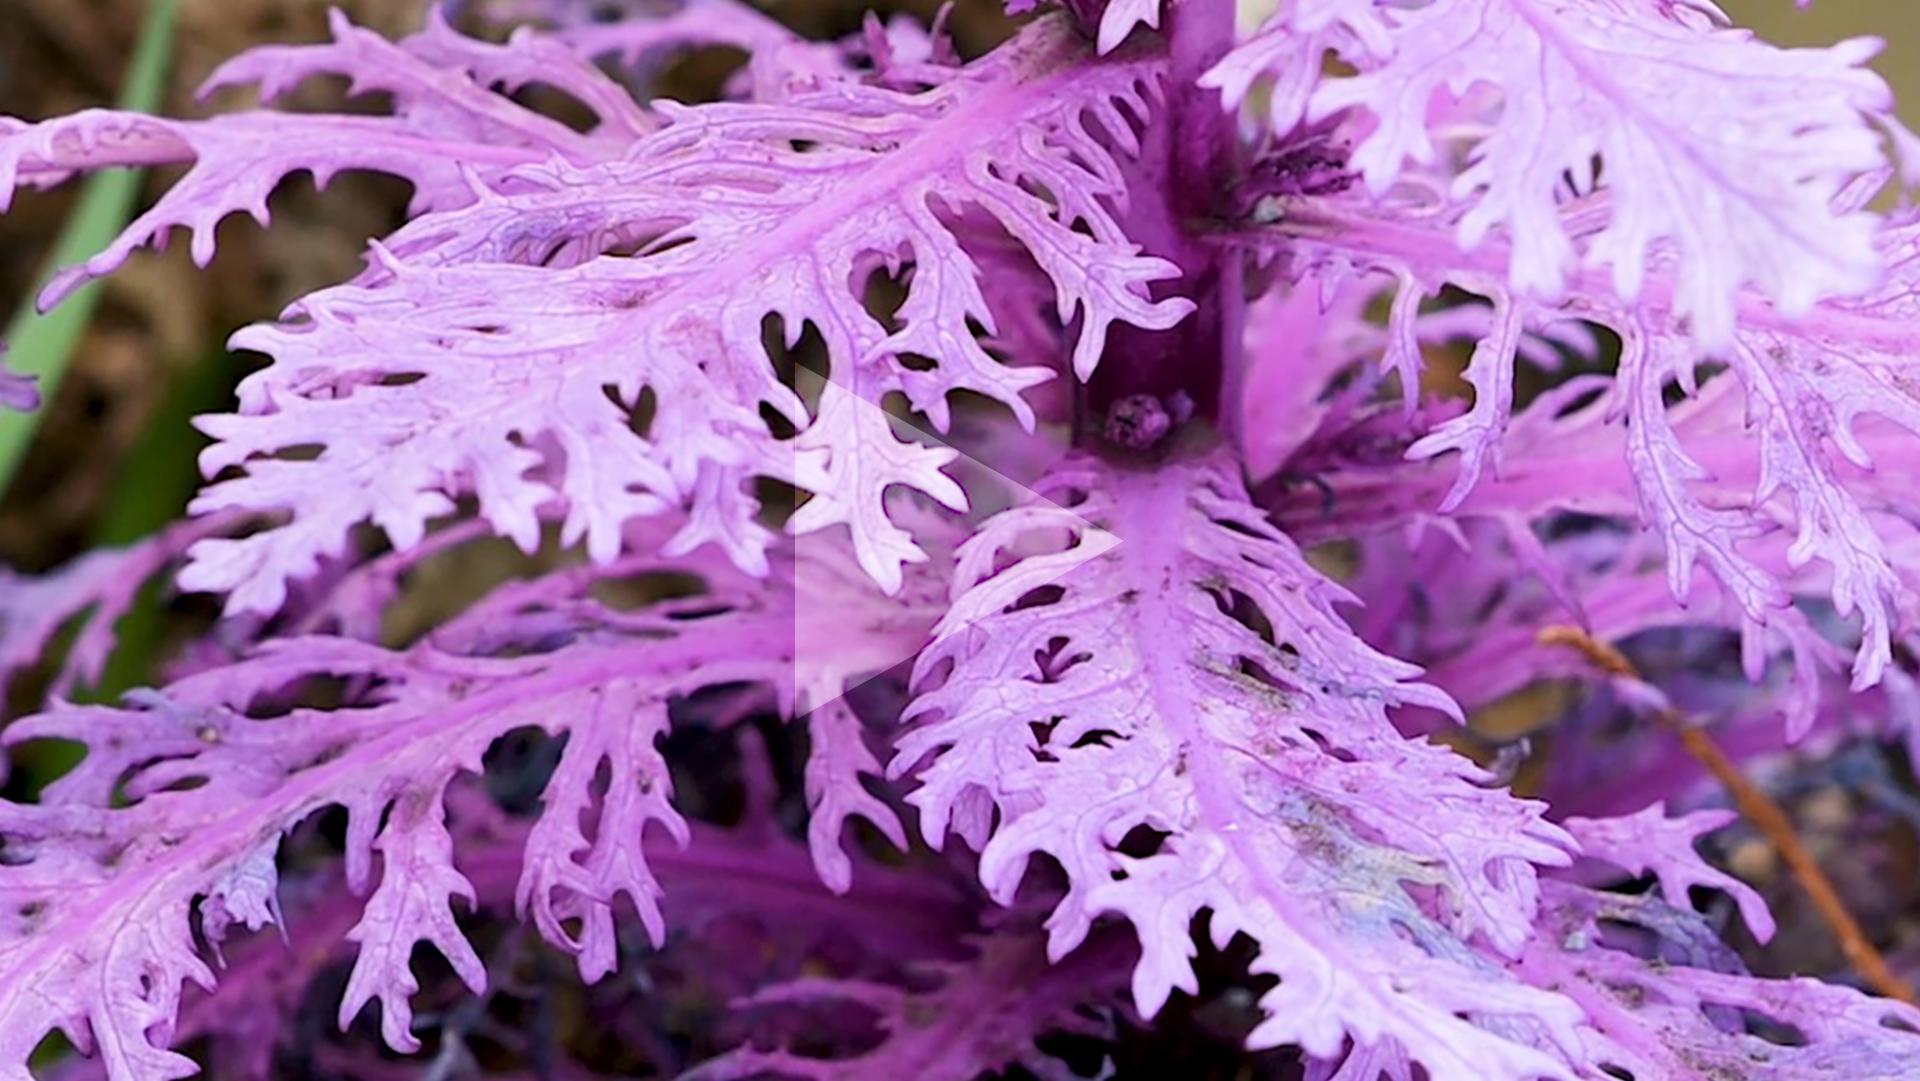 a pink fern